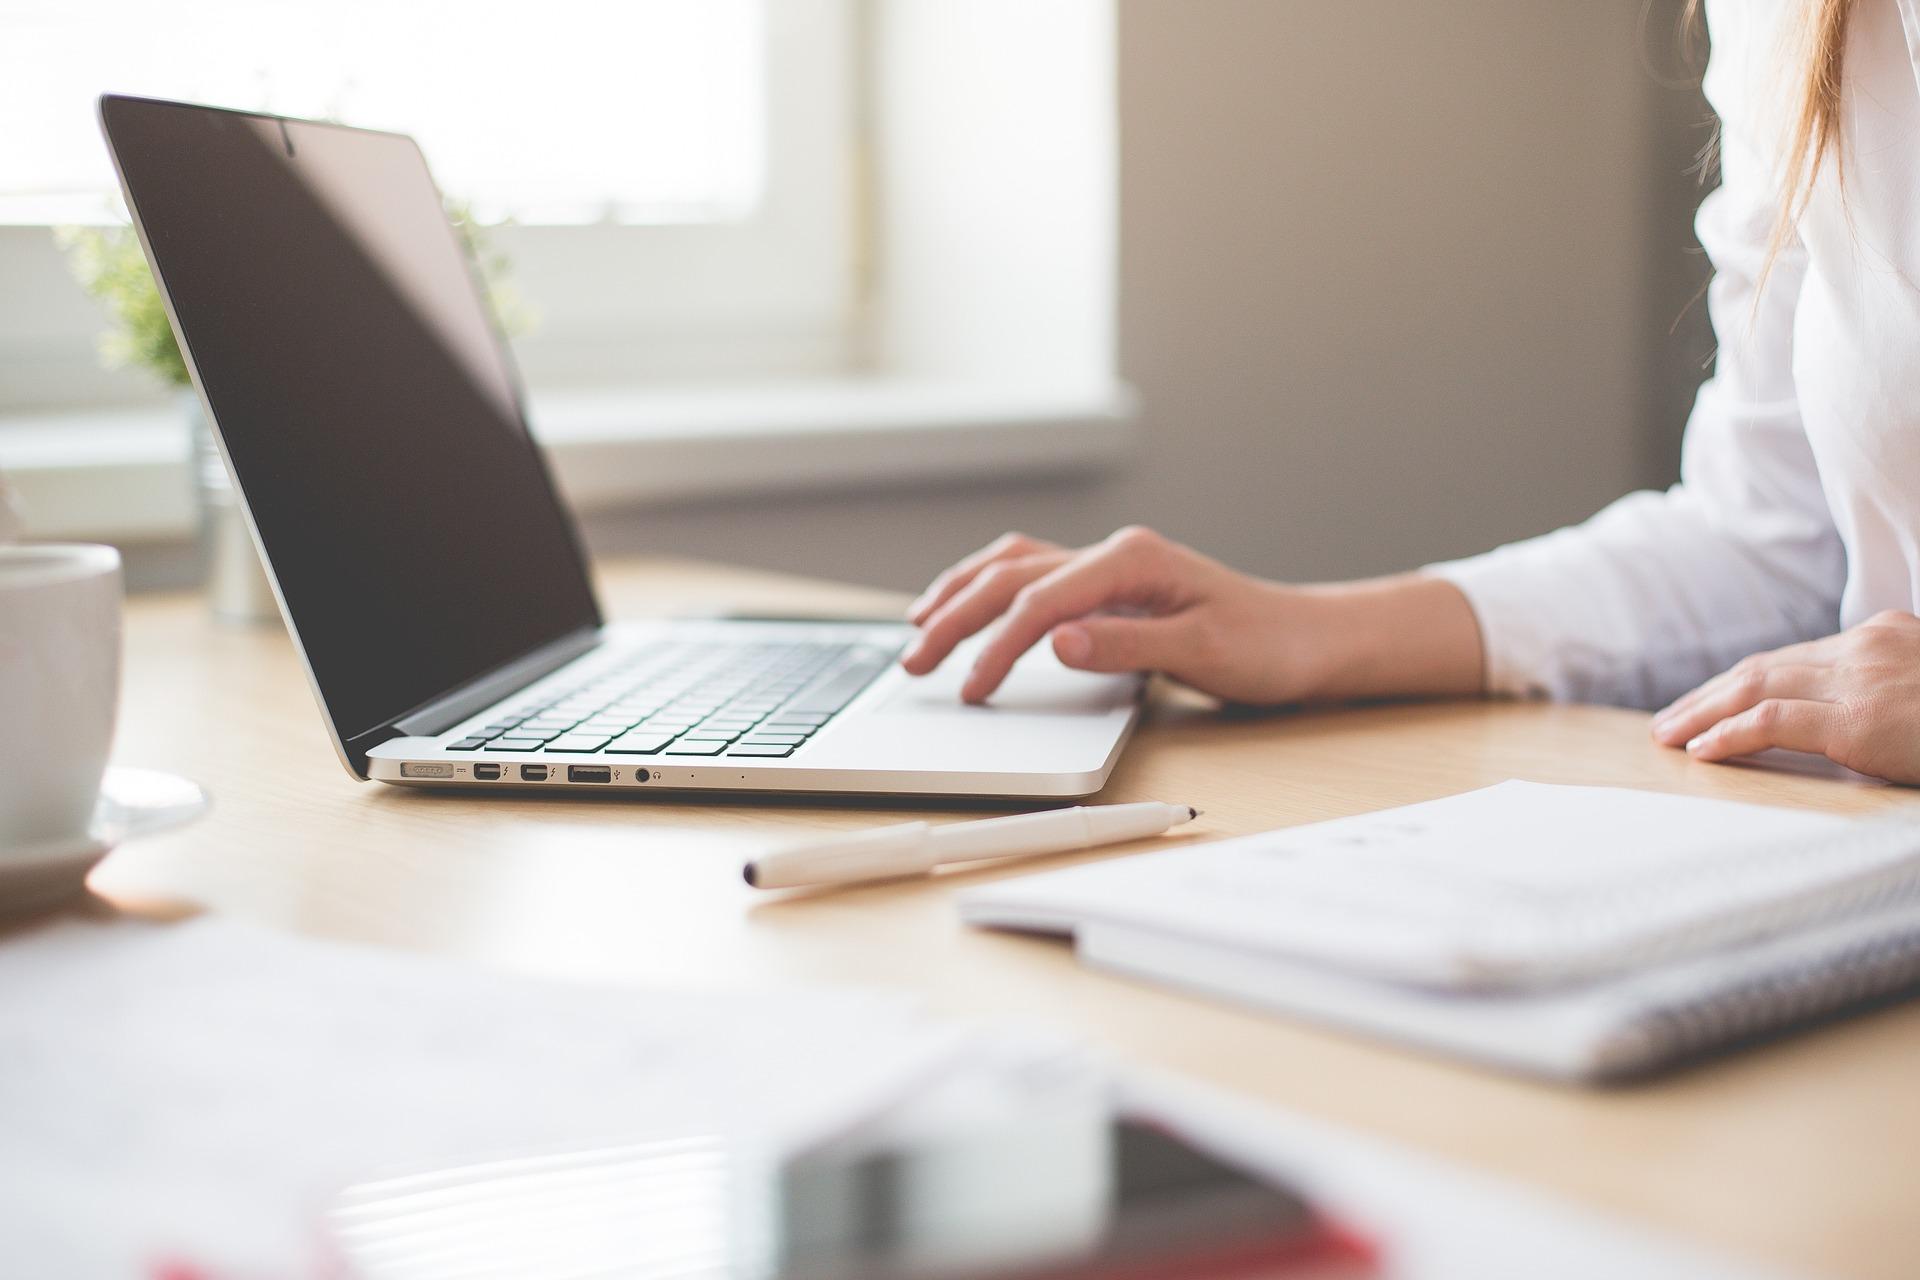 In 5 Schritten zum perfekten Interviewleitfaden